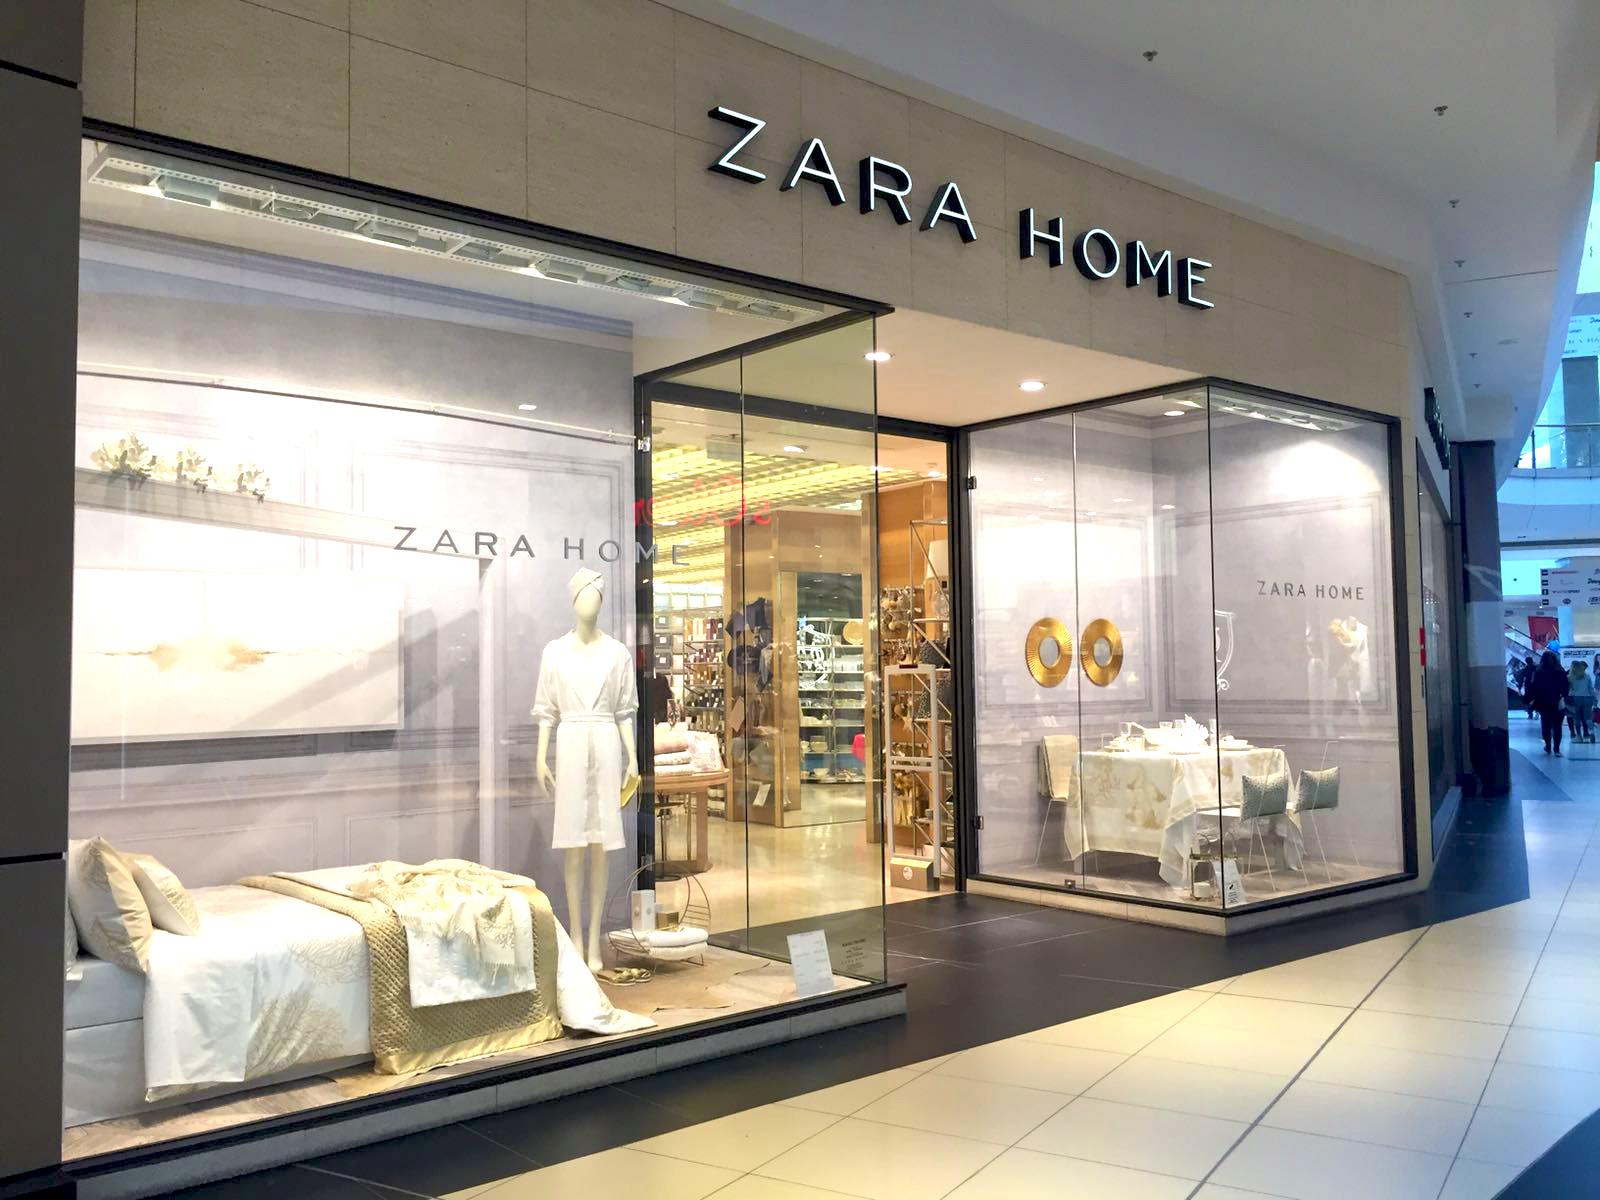 5 Pretty Decor Finds From My ZARA HOME Shopping Spree